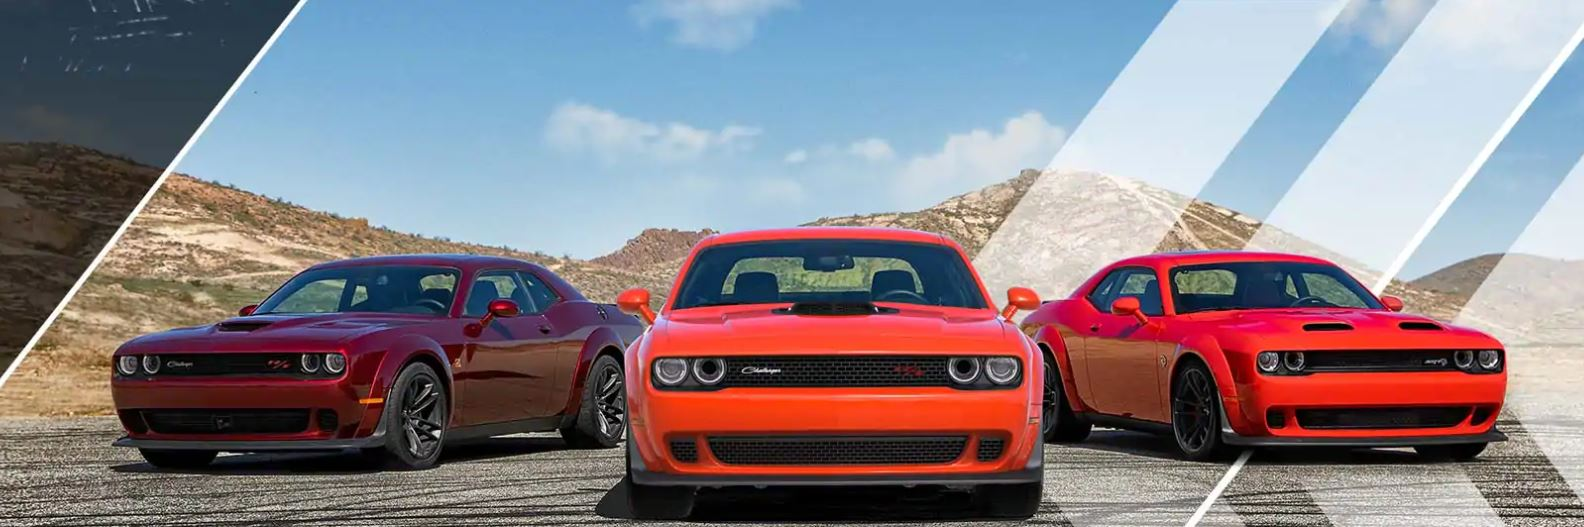 2021 Dodge Challenger Trim Levels